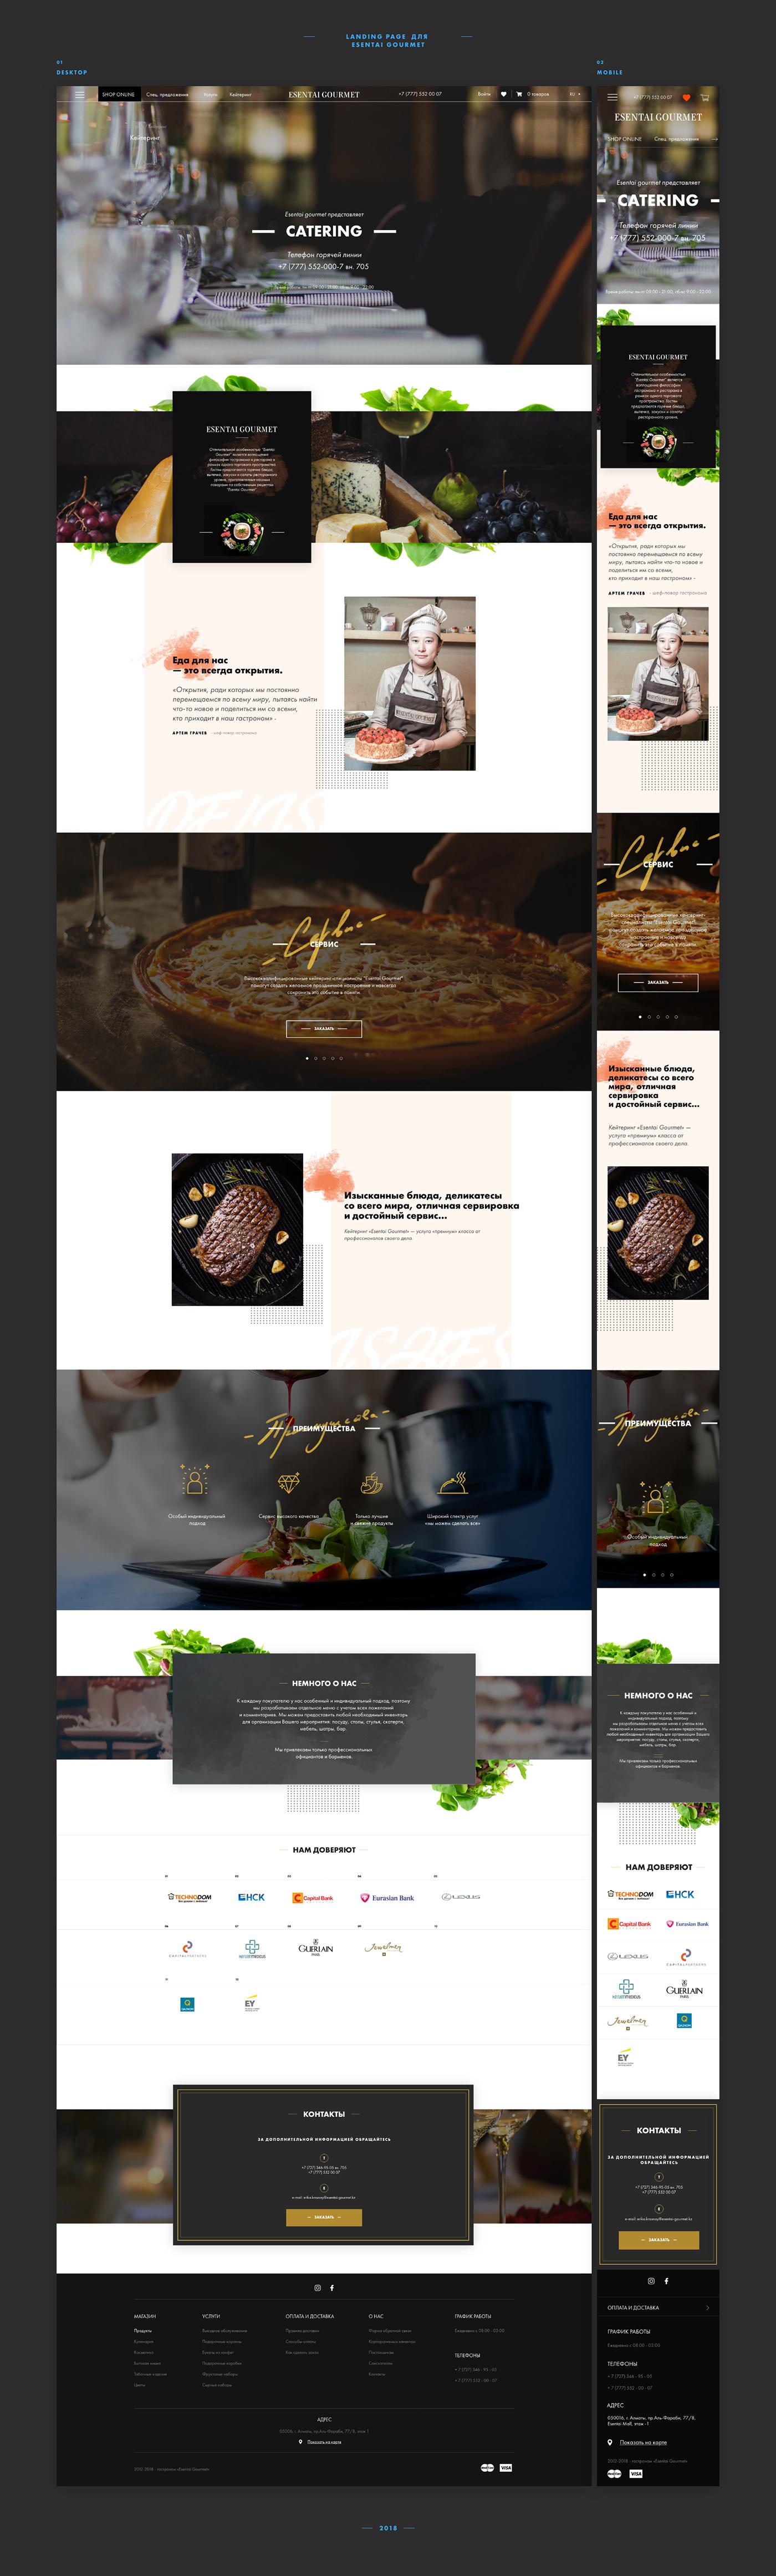 Web design Webdesign gourmet creative almaty kazakhstan